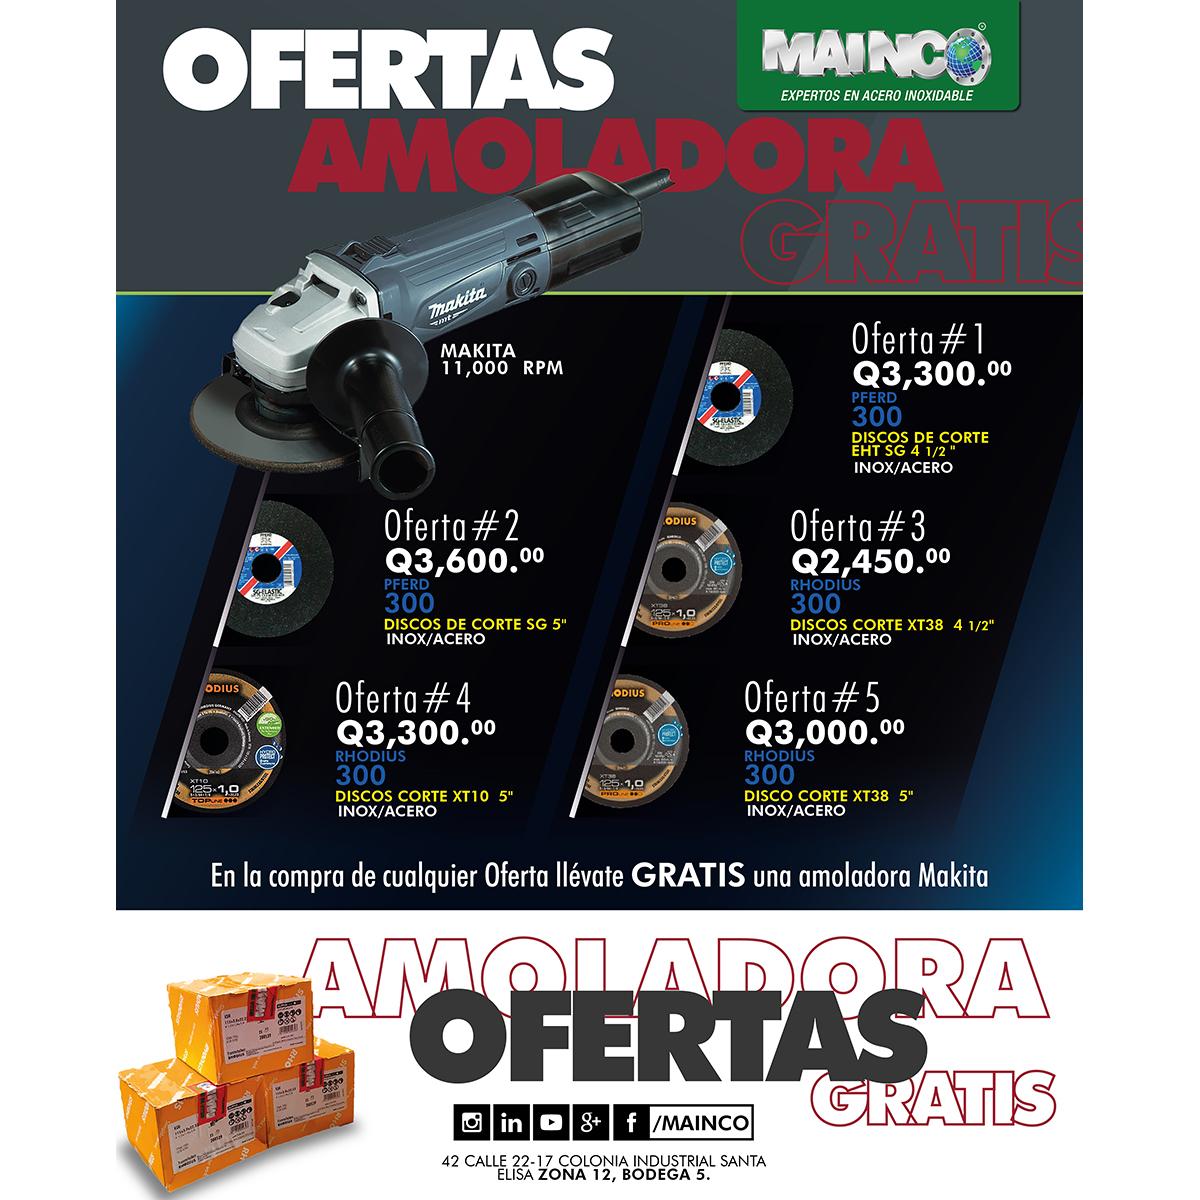 OFERTAS AMOLADORA GRATIS